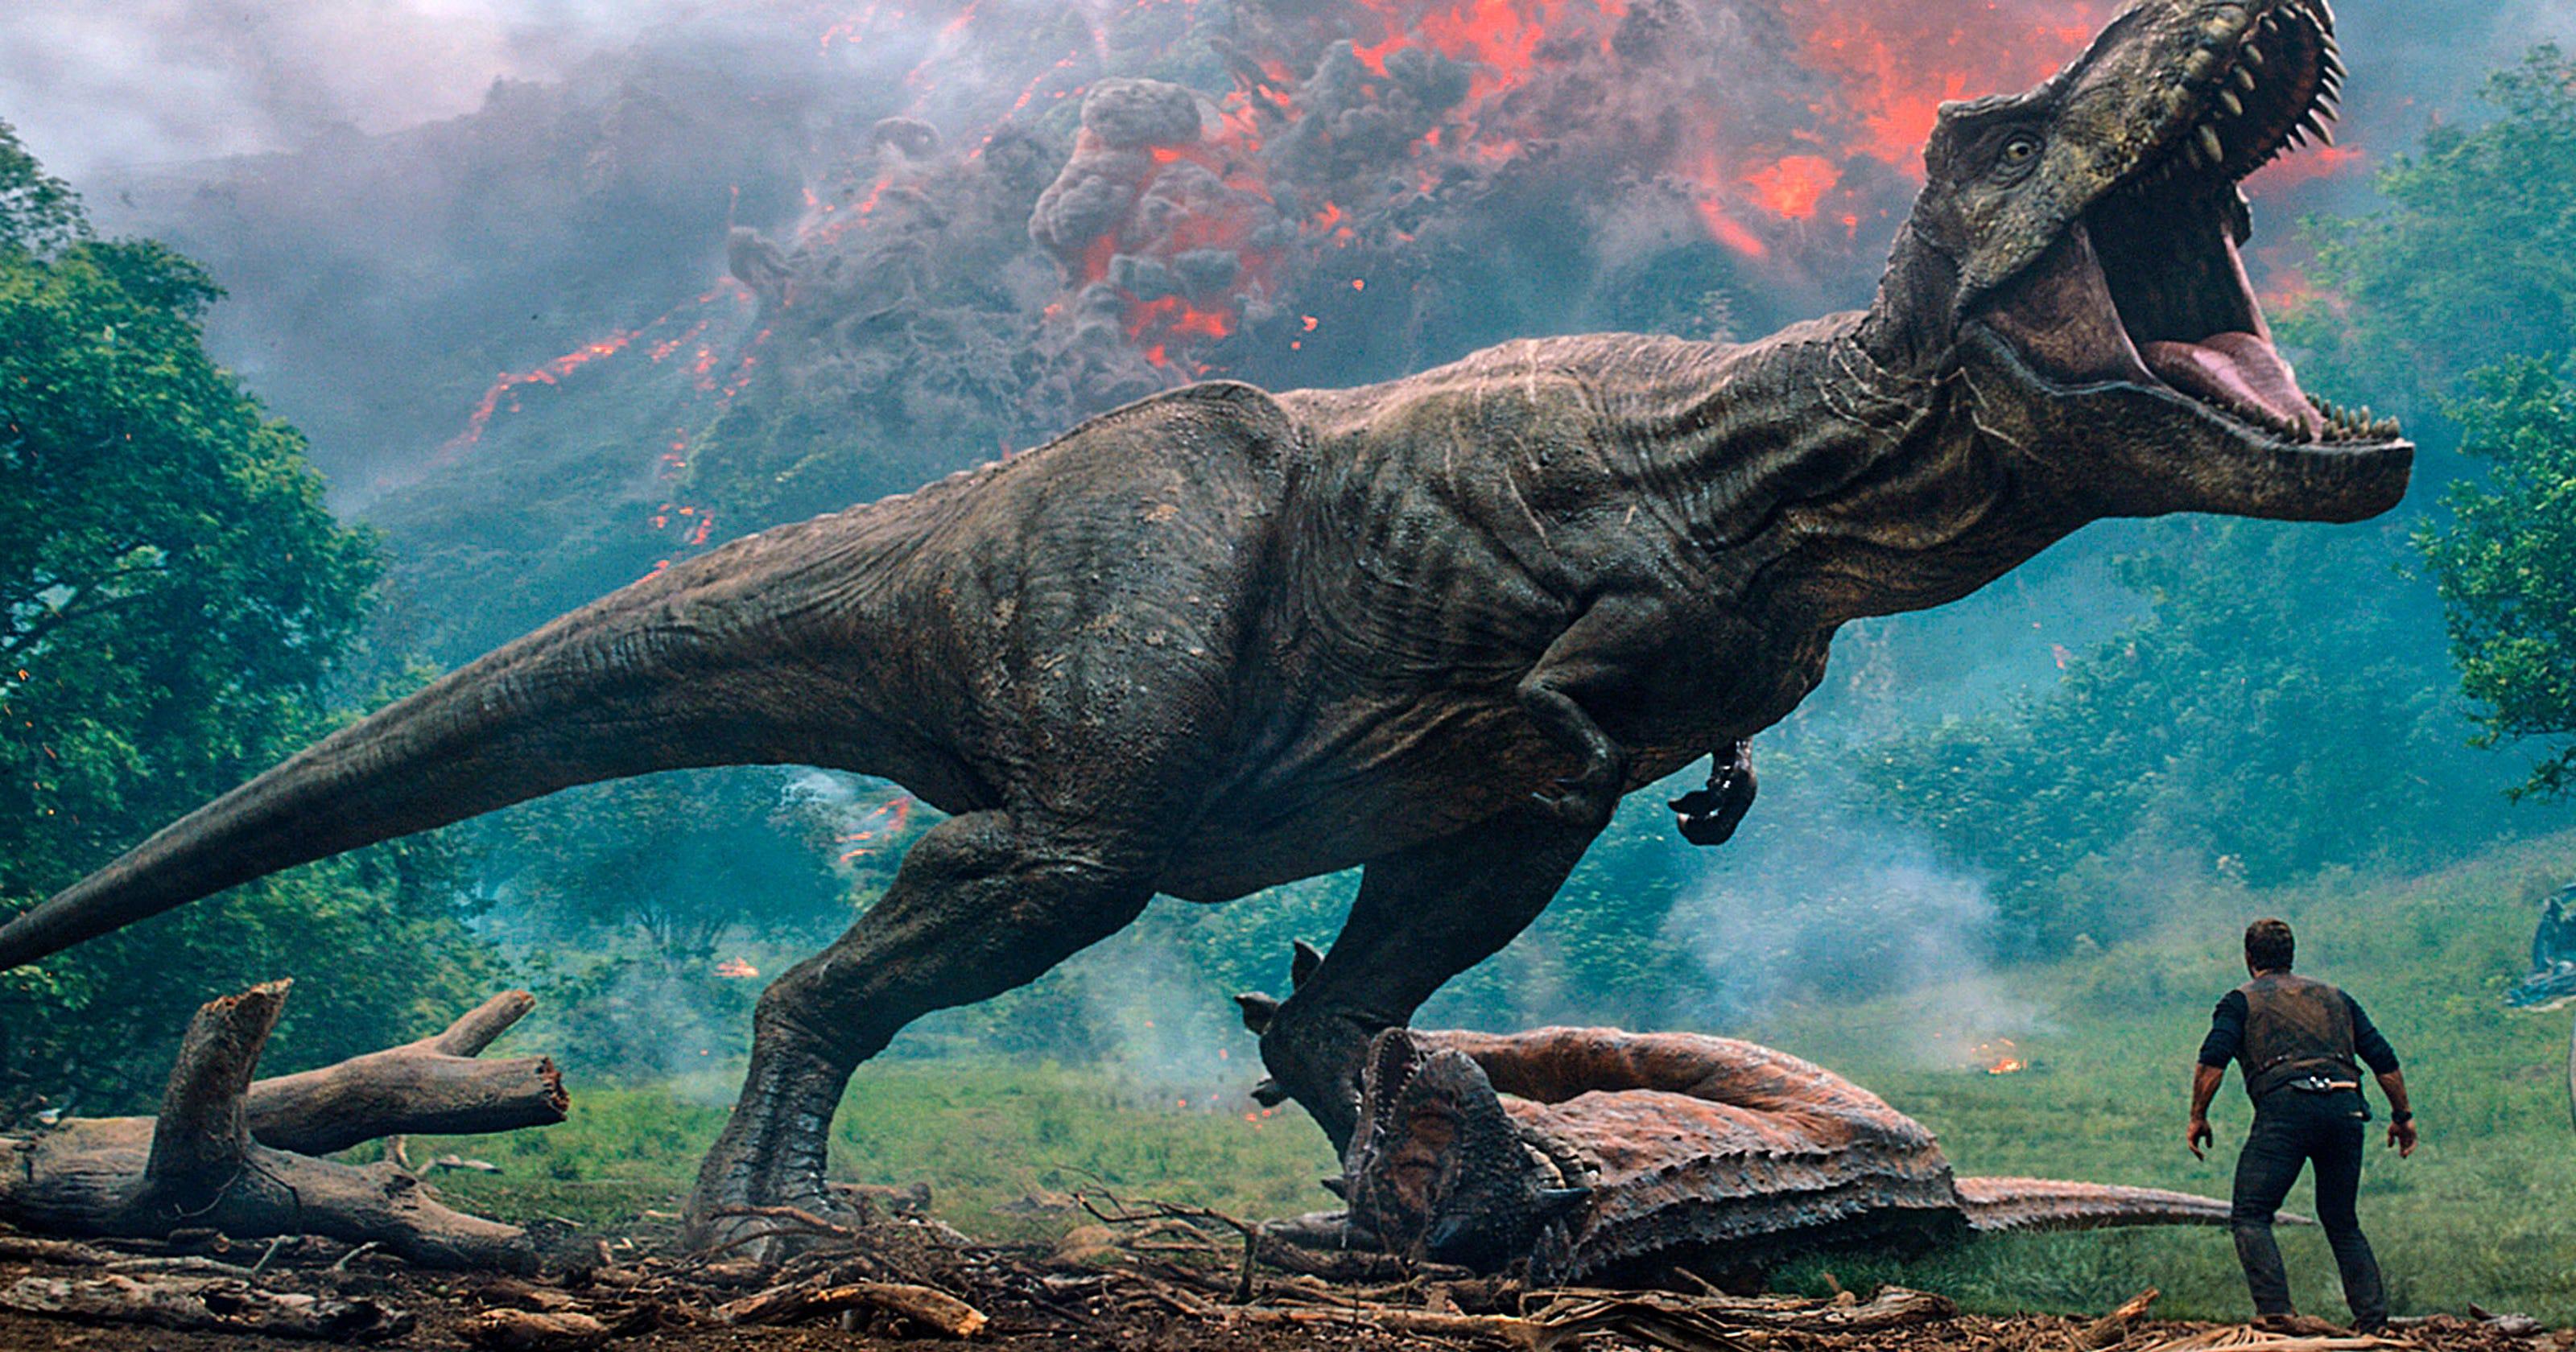 On Screen In Milwaukee Jurassic World Sequel Mr Rogers Movie Prime 1 Studio Tyrannosaurus Rex Park 1993 15 Free Movies